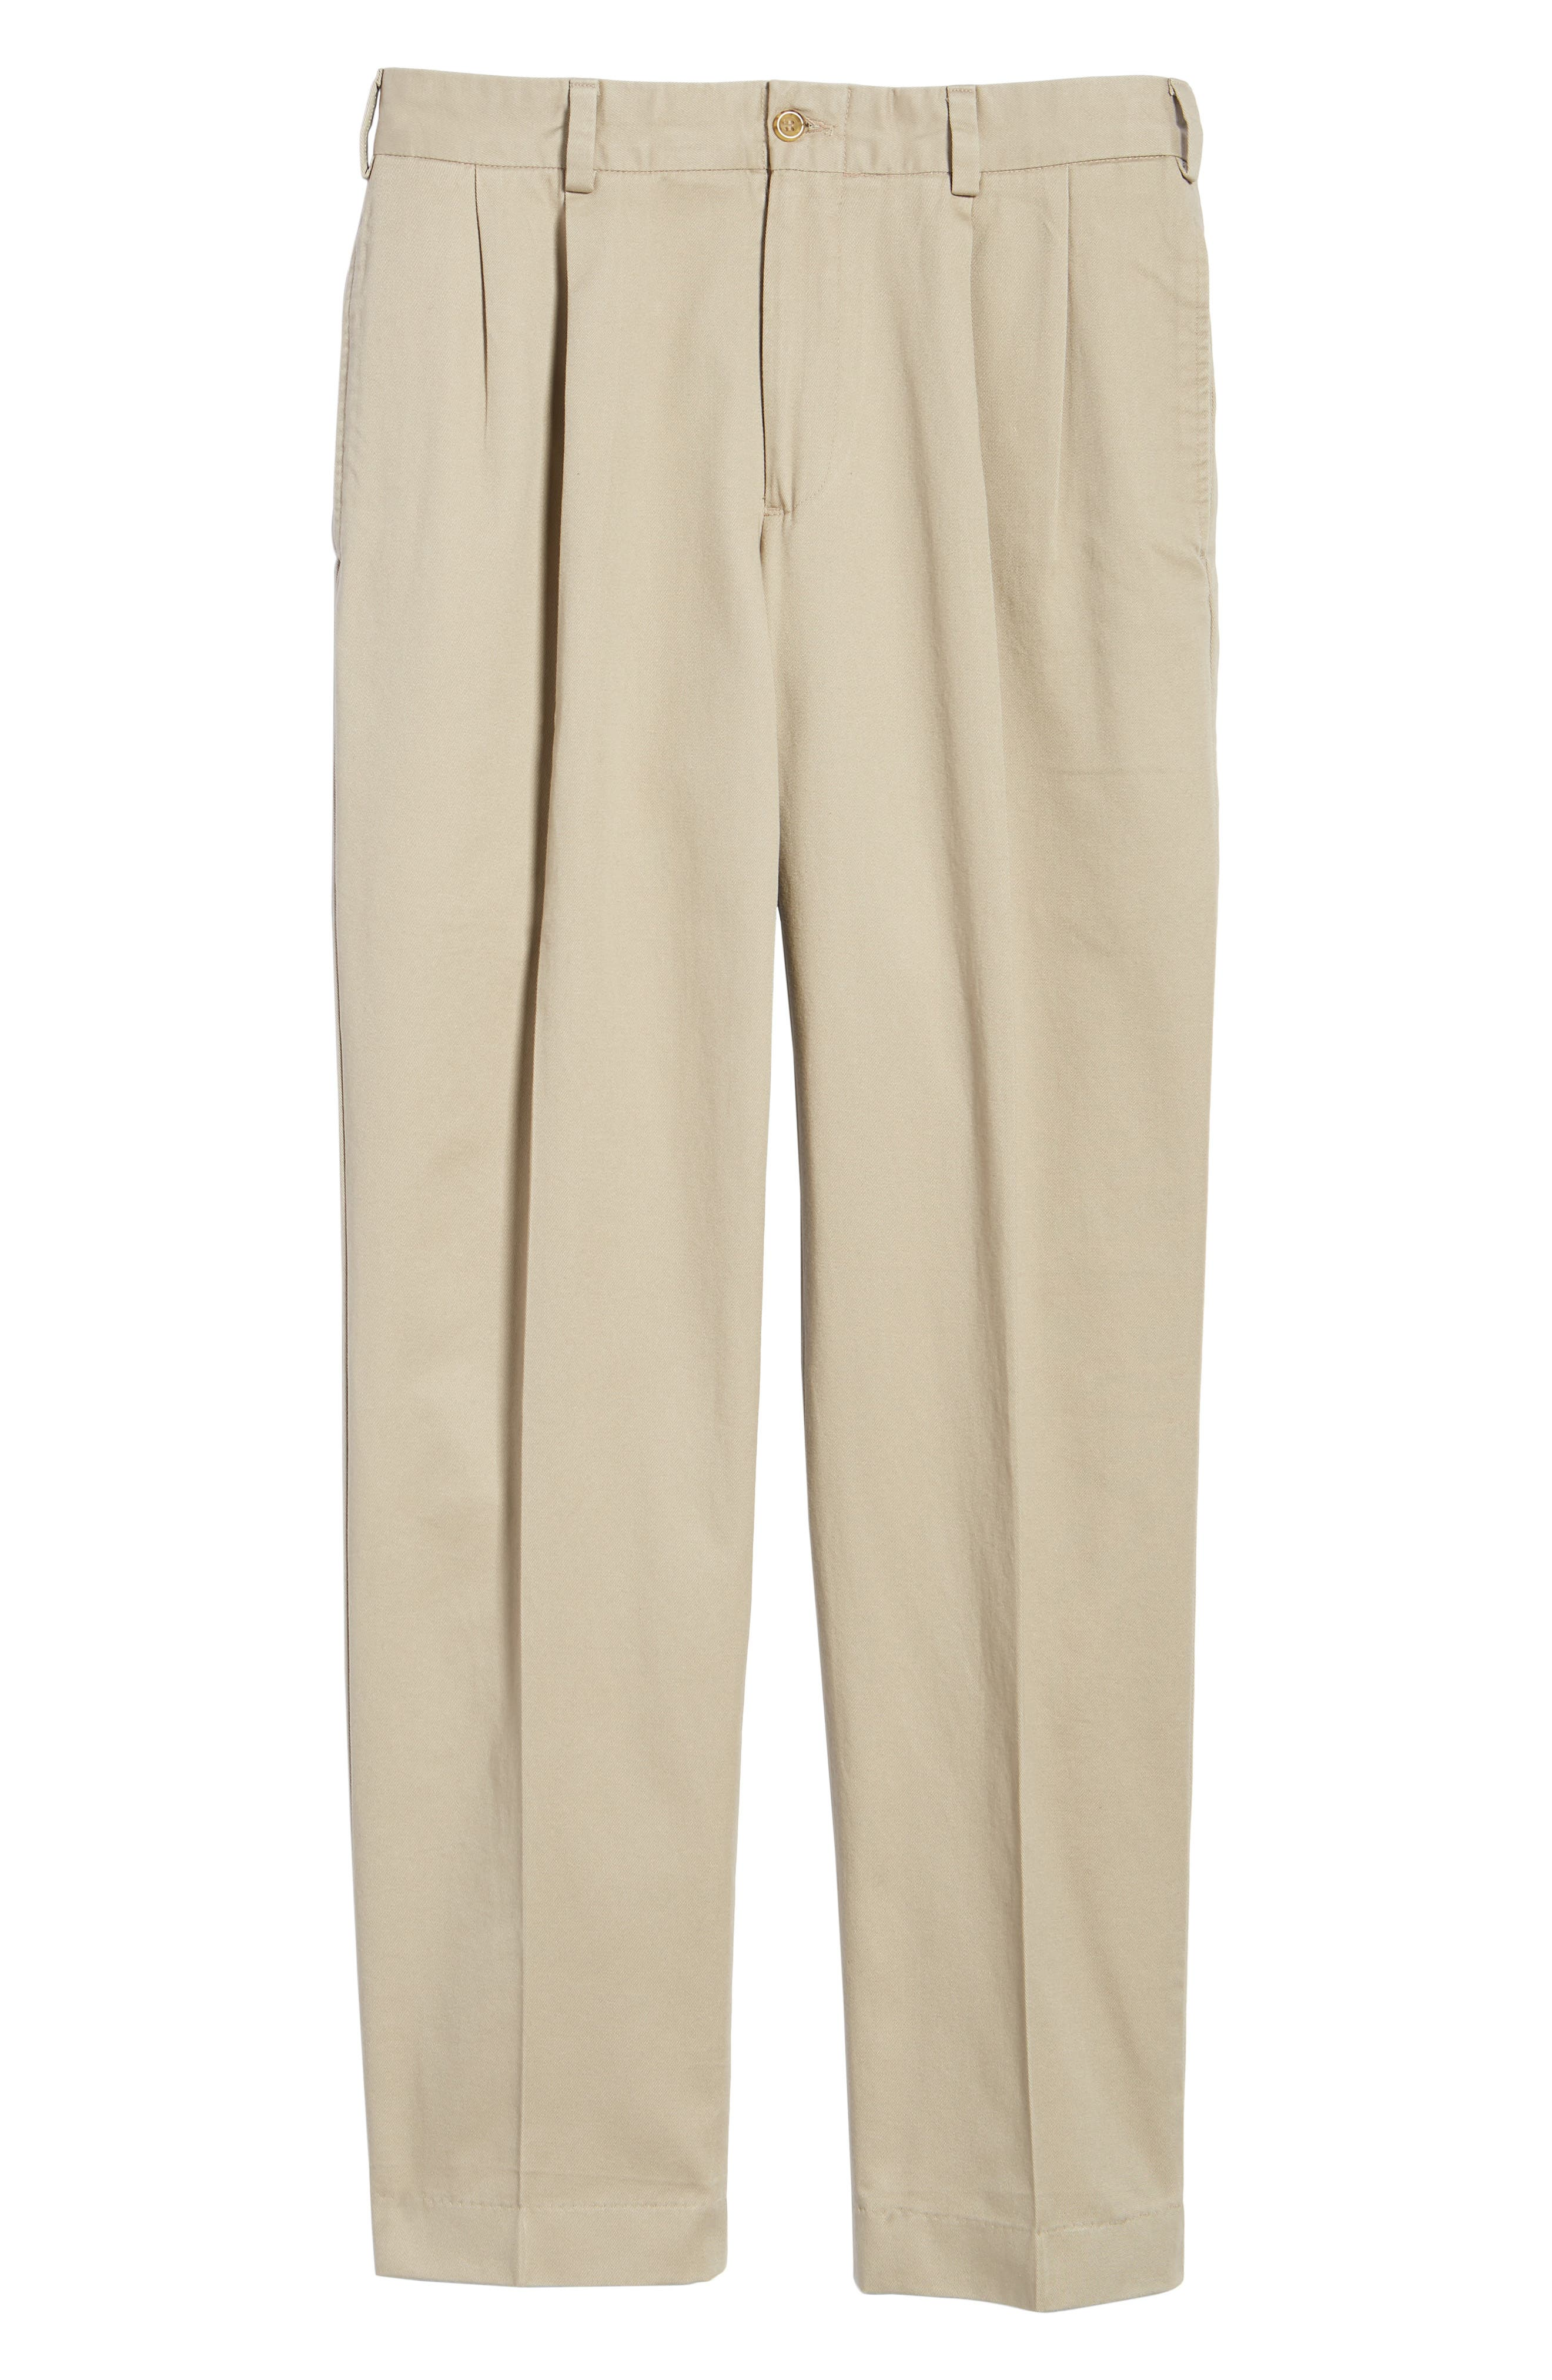 M2 Classic Fit Pleated Vintage Twill Pants,                             Alternate thumbnail 6, color,                             Khaki